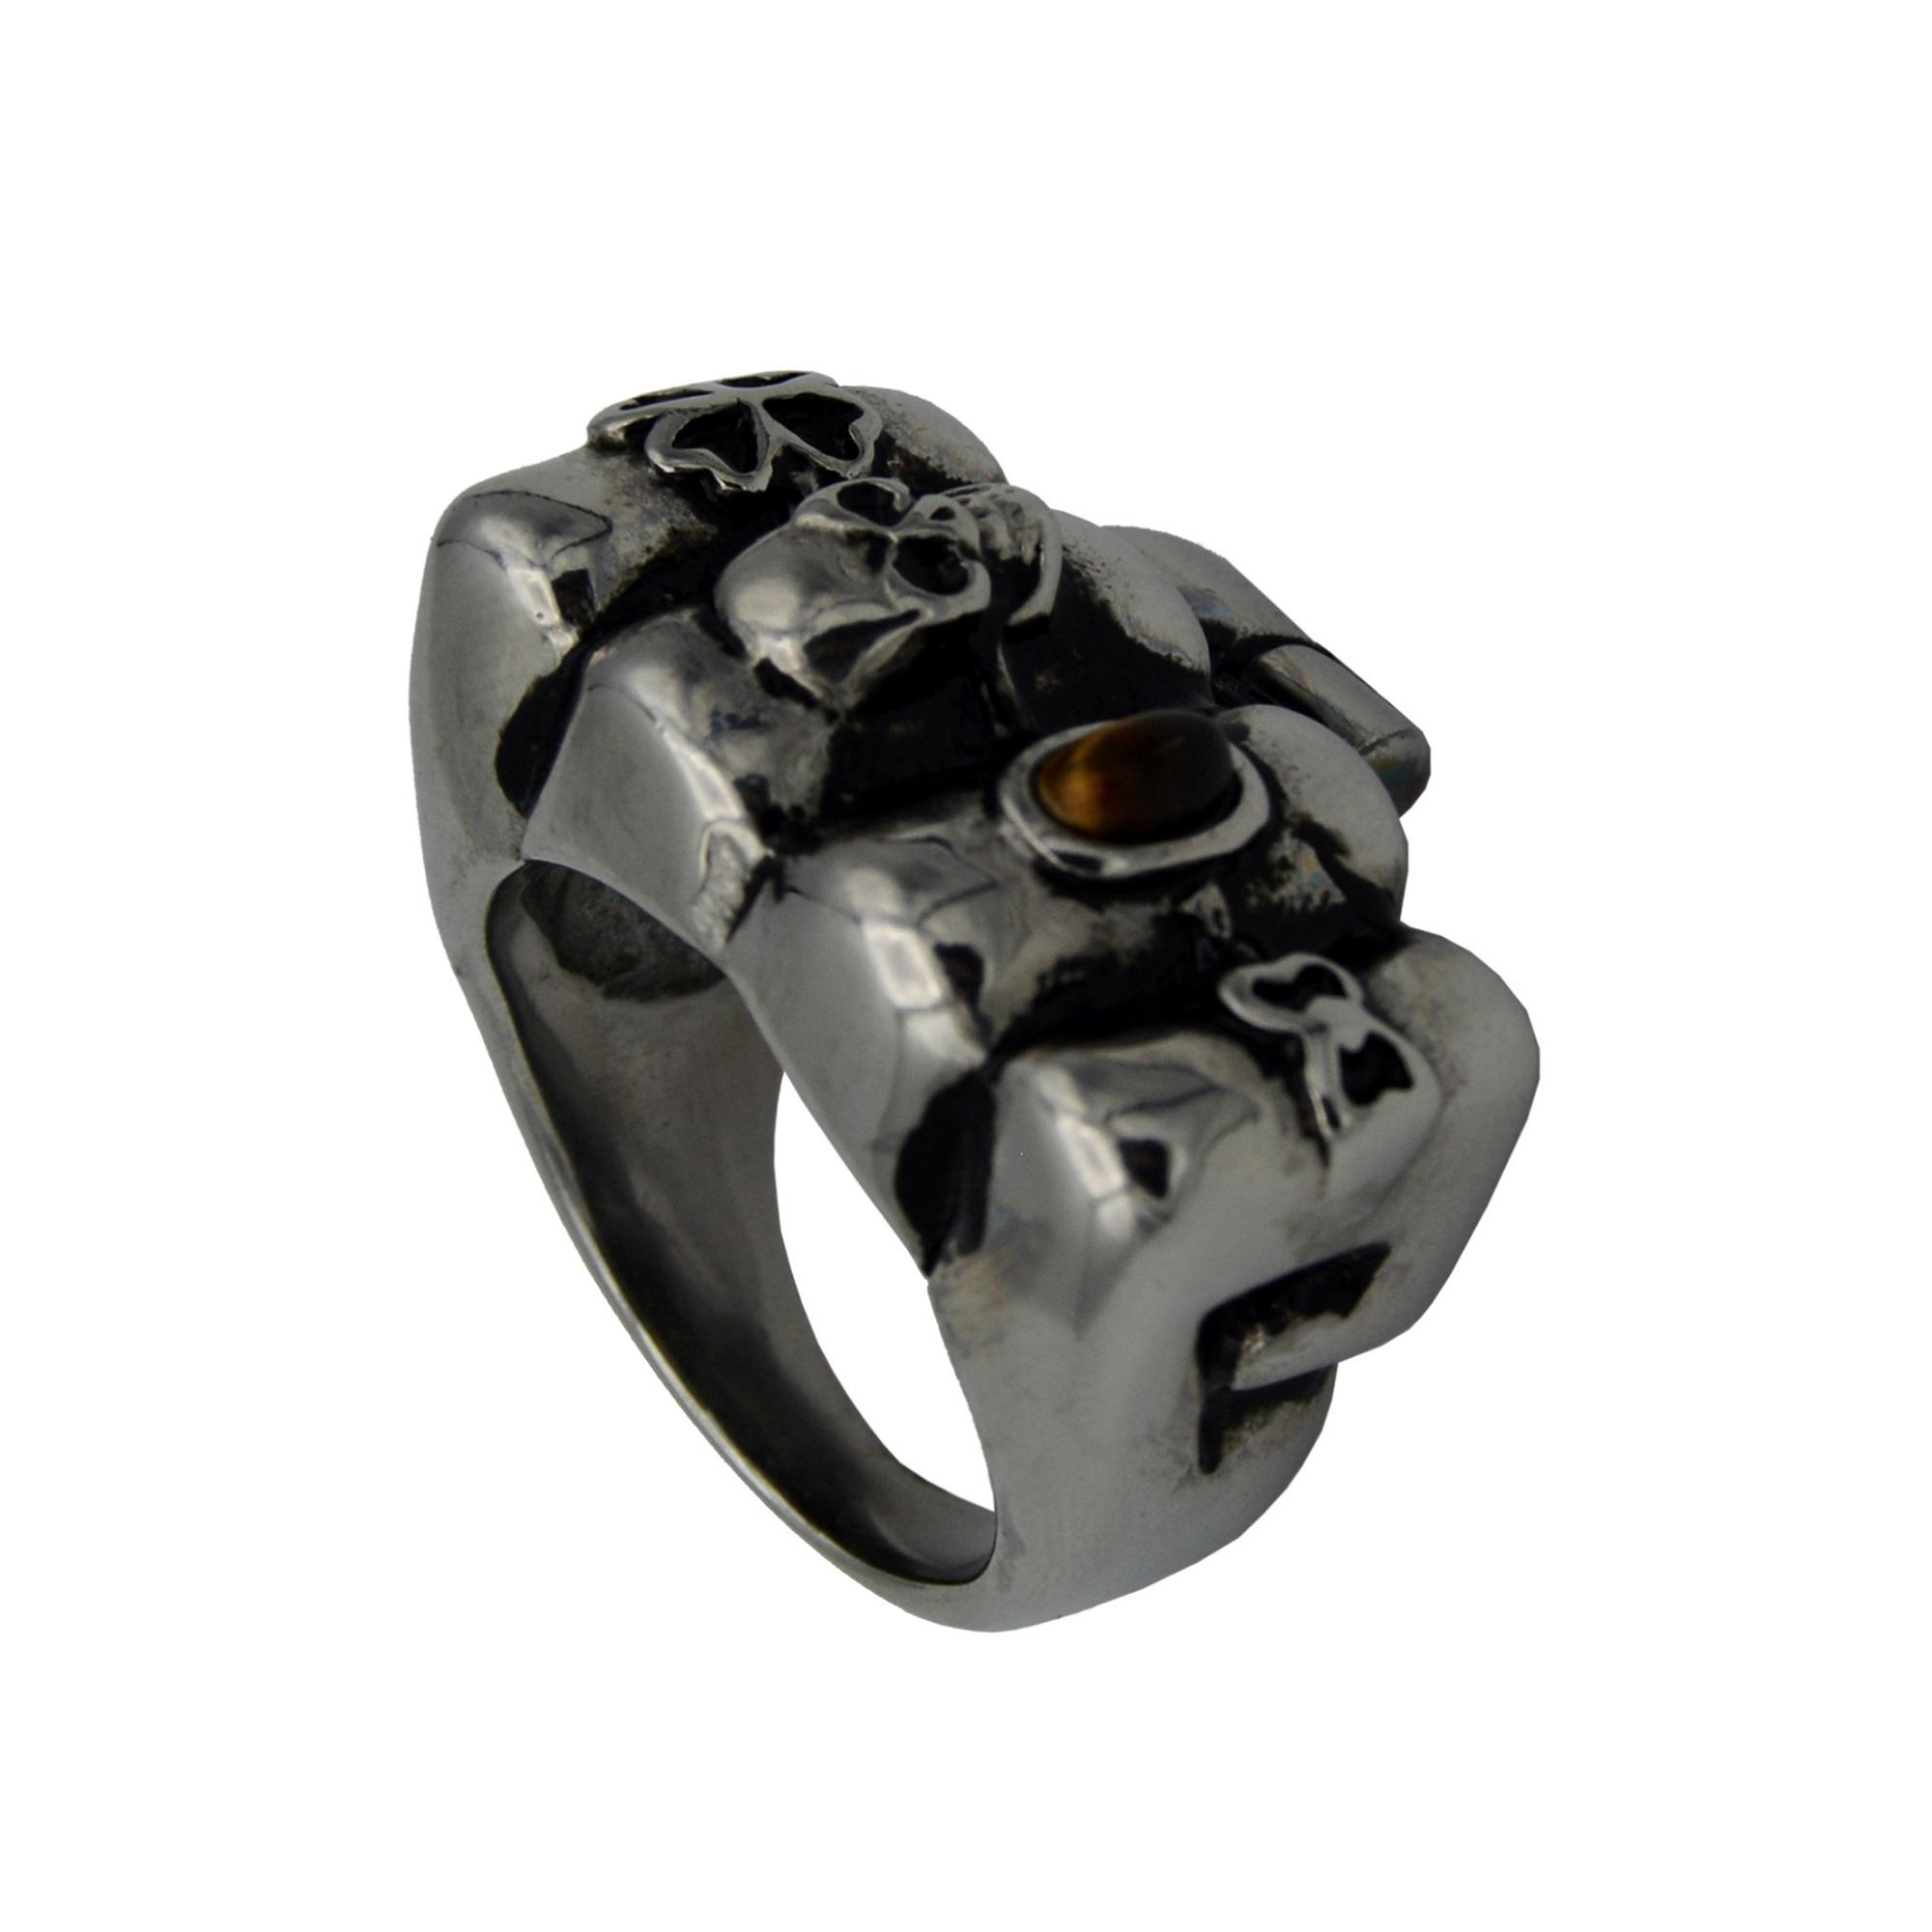 انگشتر مردانه طرح Hand-Skull کد St-50